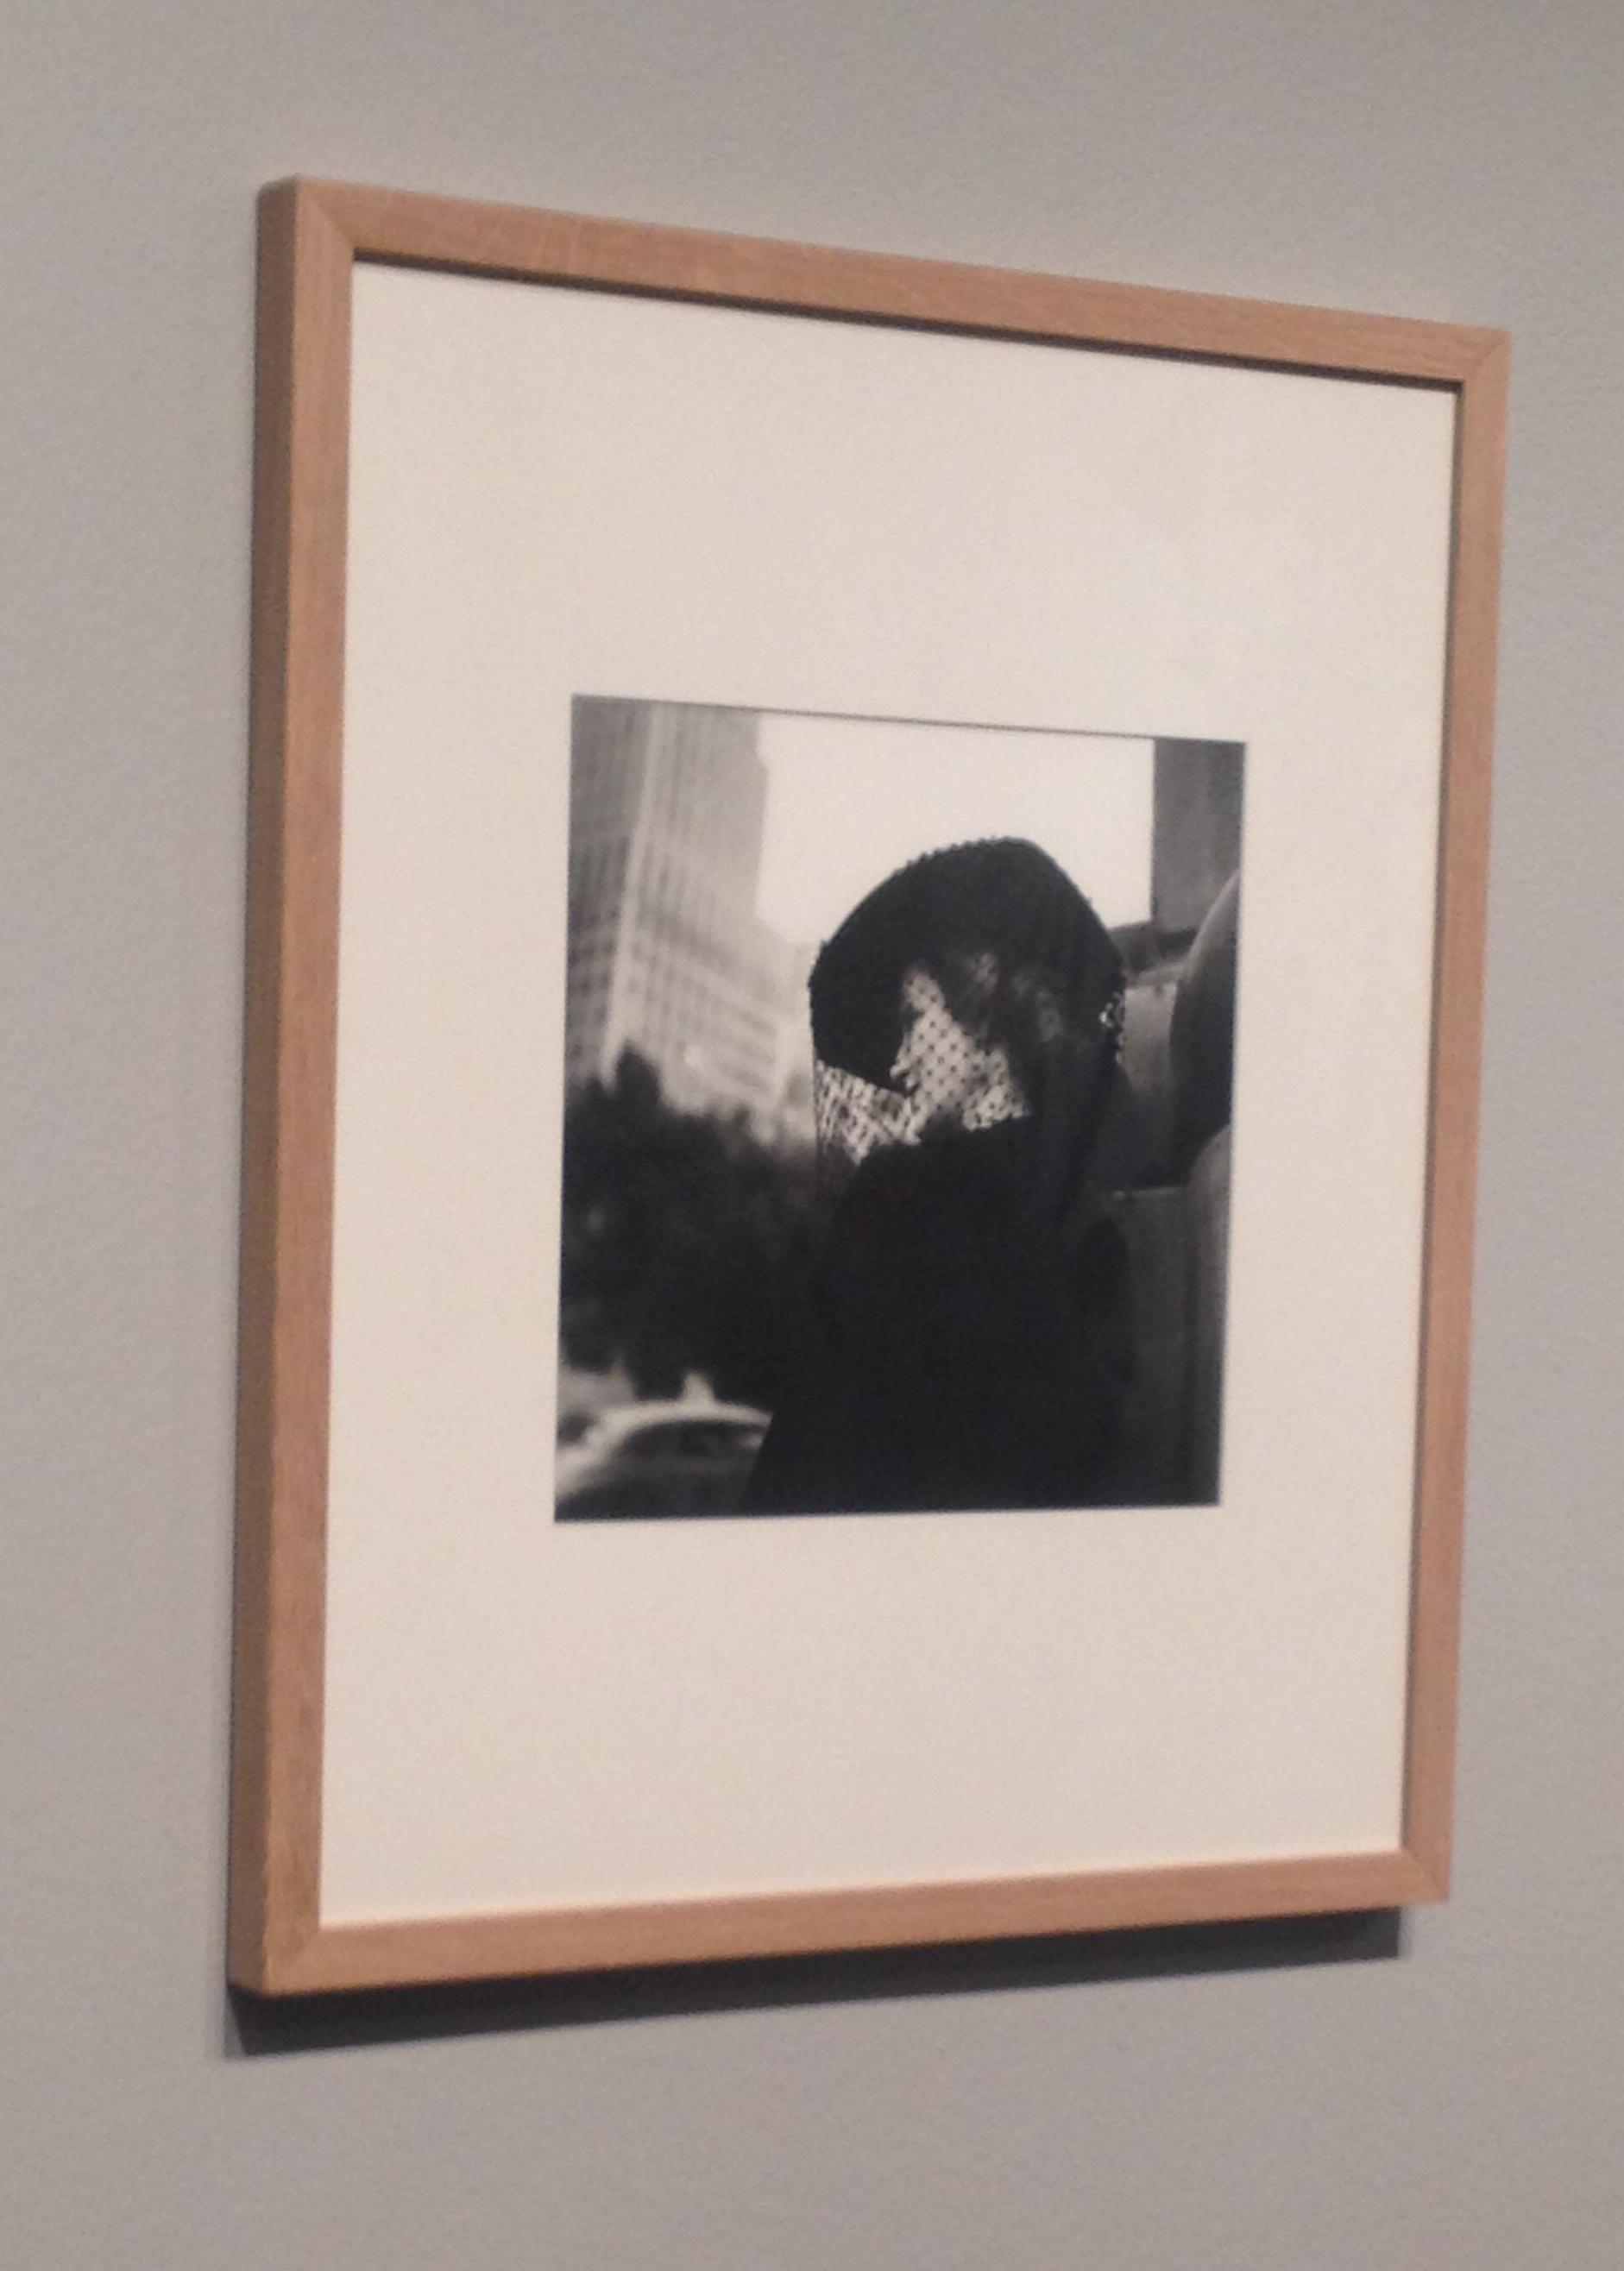 Photograph by Vivian Maier in Gothenburg museum | Tall Girl Meets World